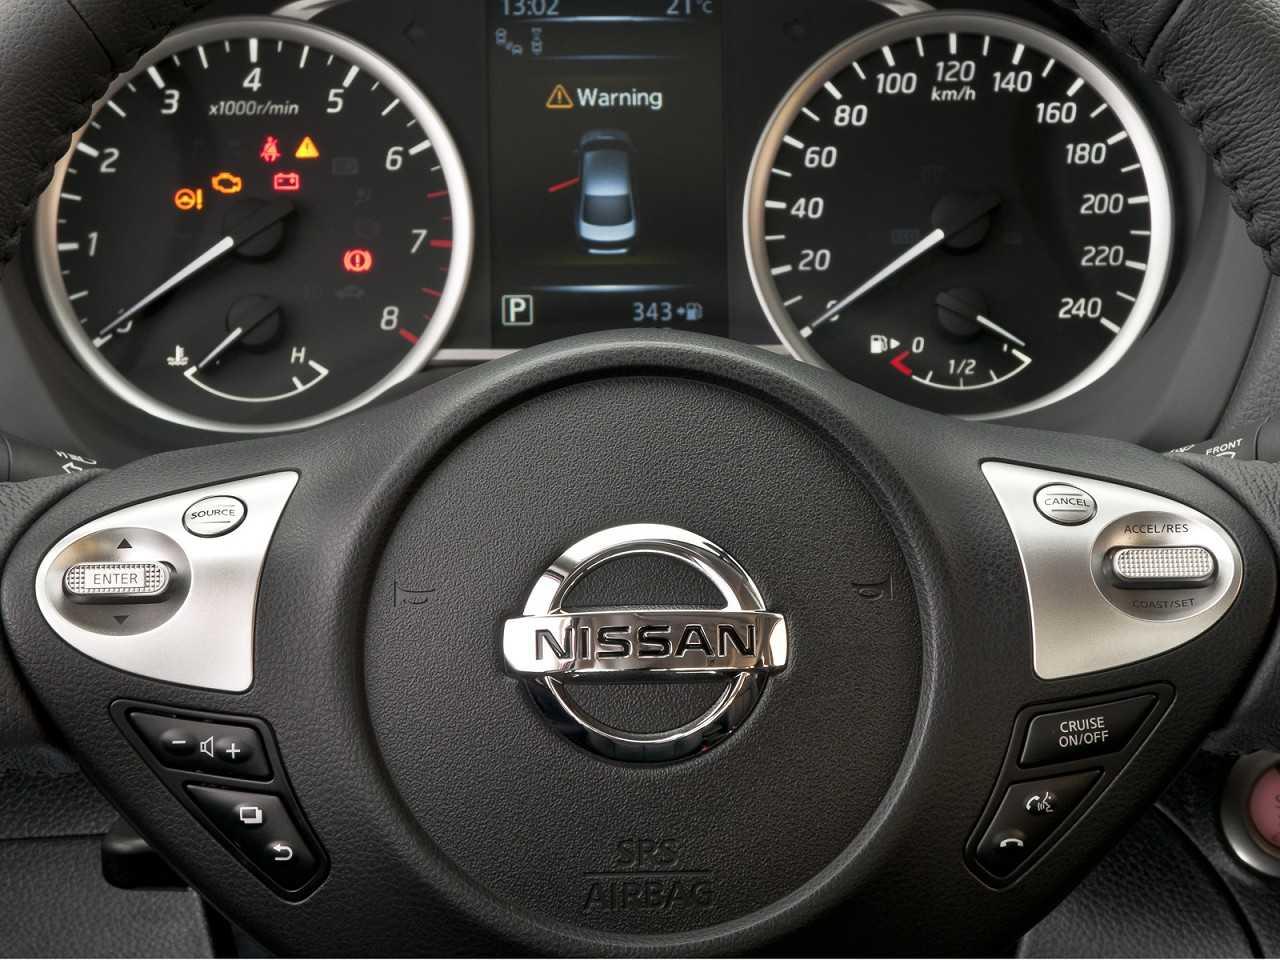 NissanSentra 2017 - painel de instrumentos